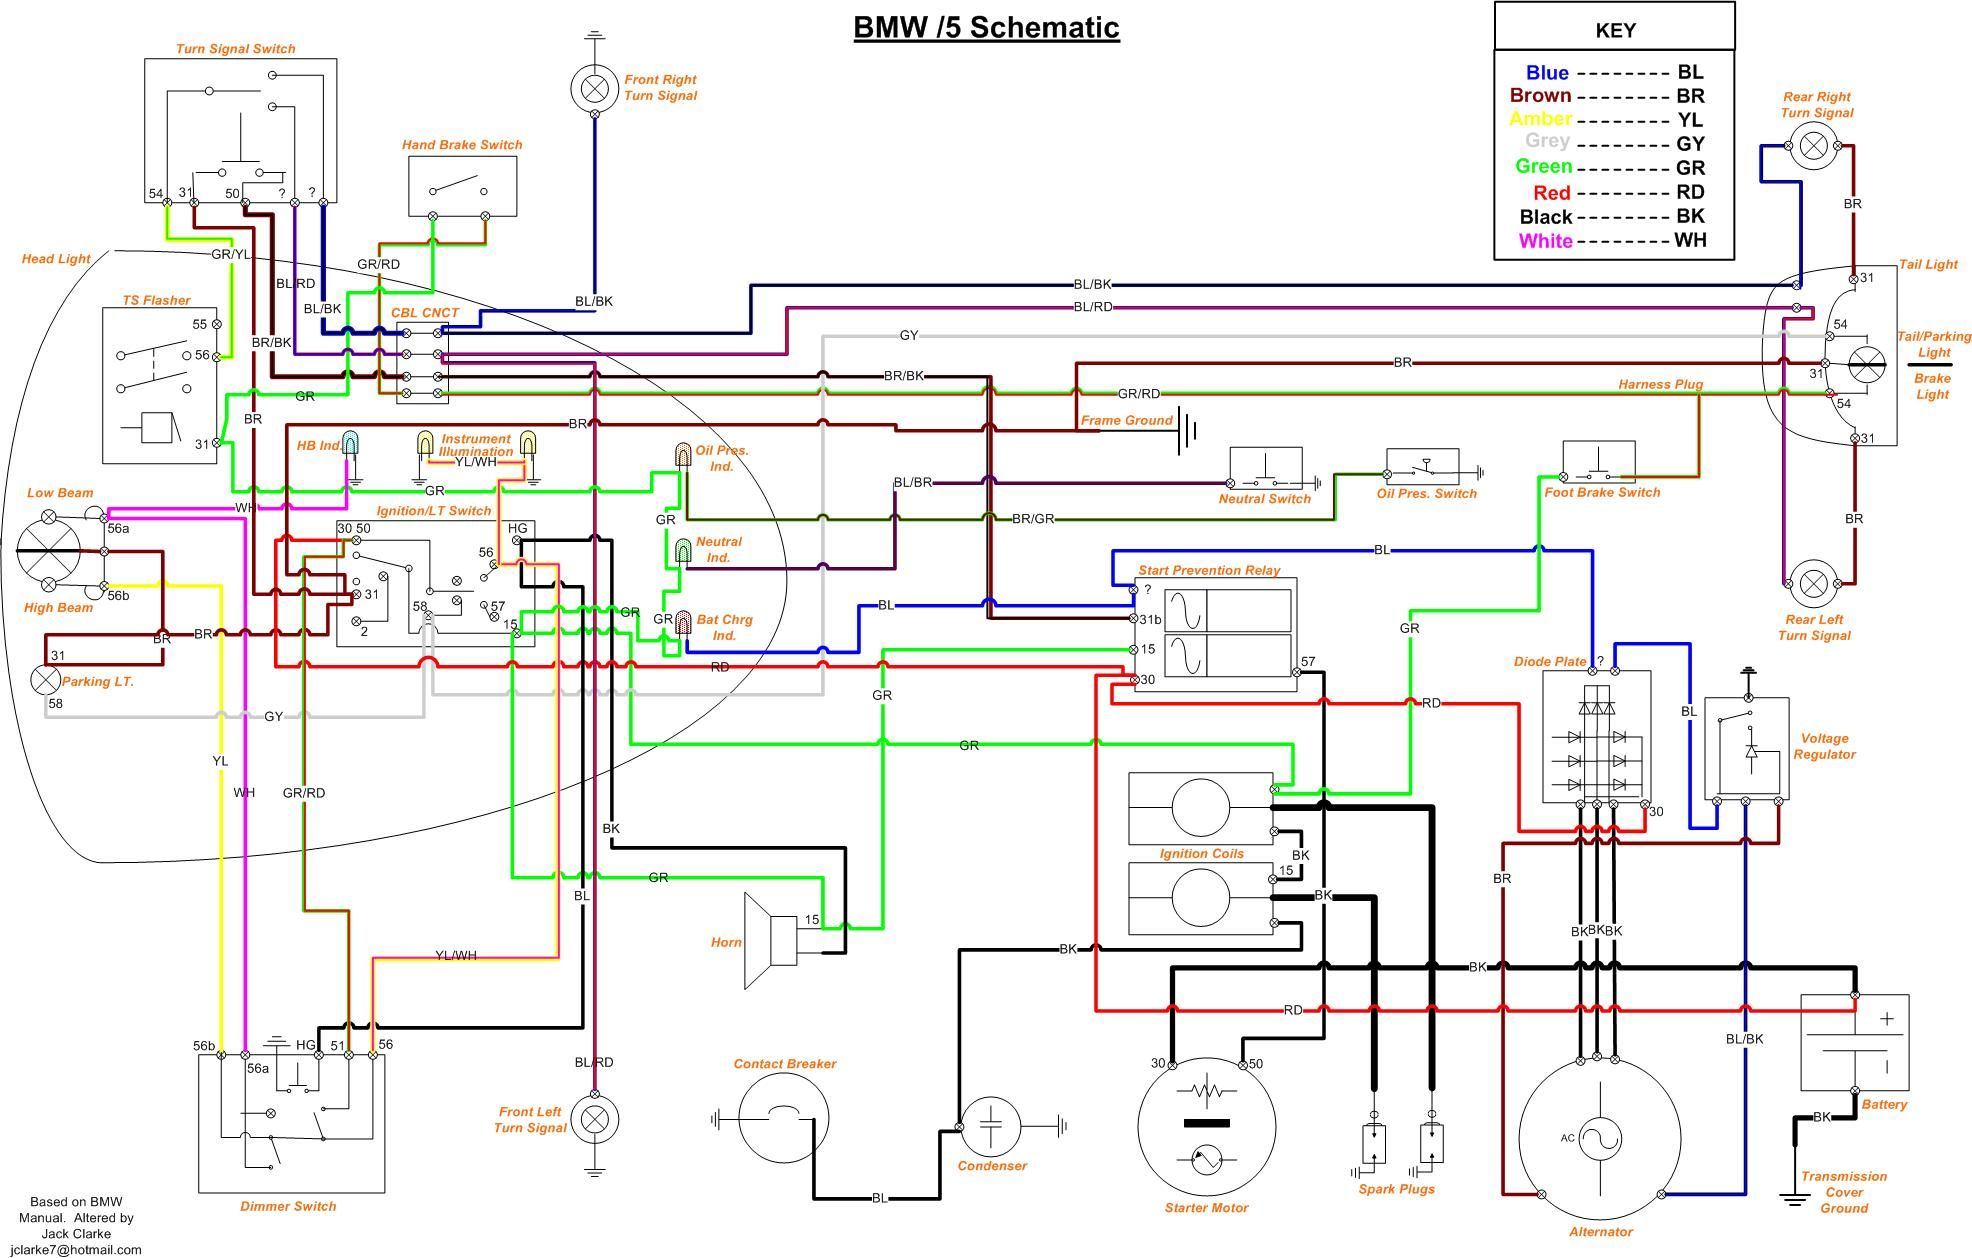 dt_7154] bmw r50 2 wiring diagram  weasi pendu xlexi egre hapolo ical intap nuvit xolia inama mohammedshrine  librar wiring 101